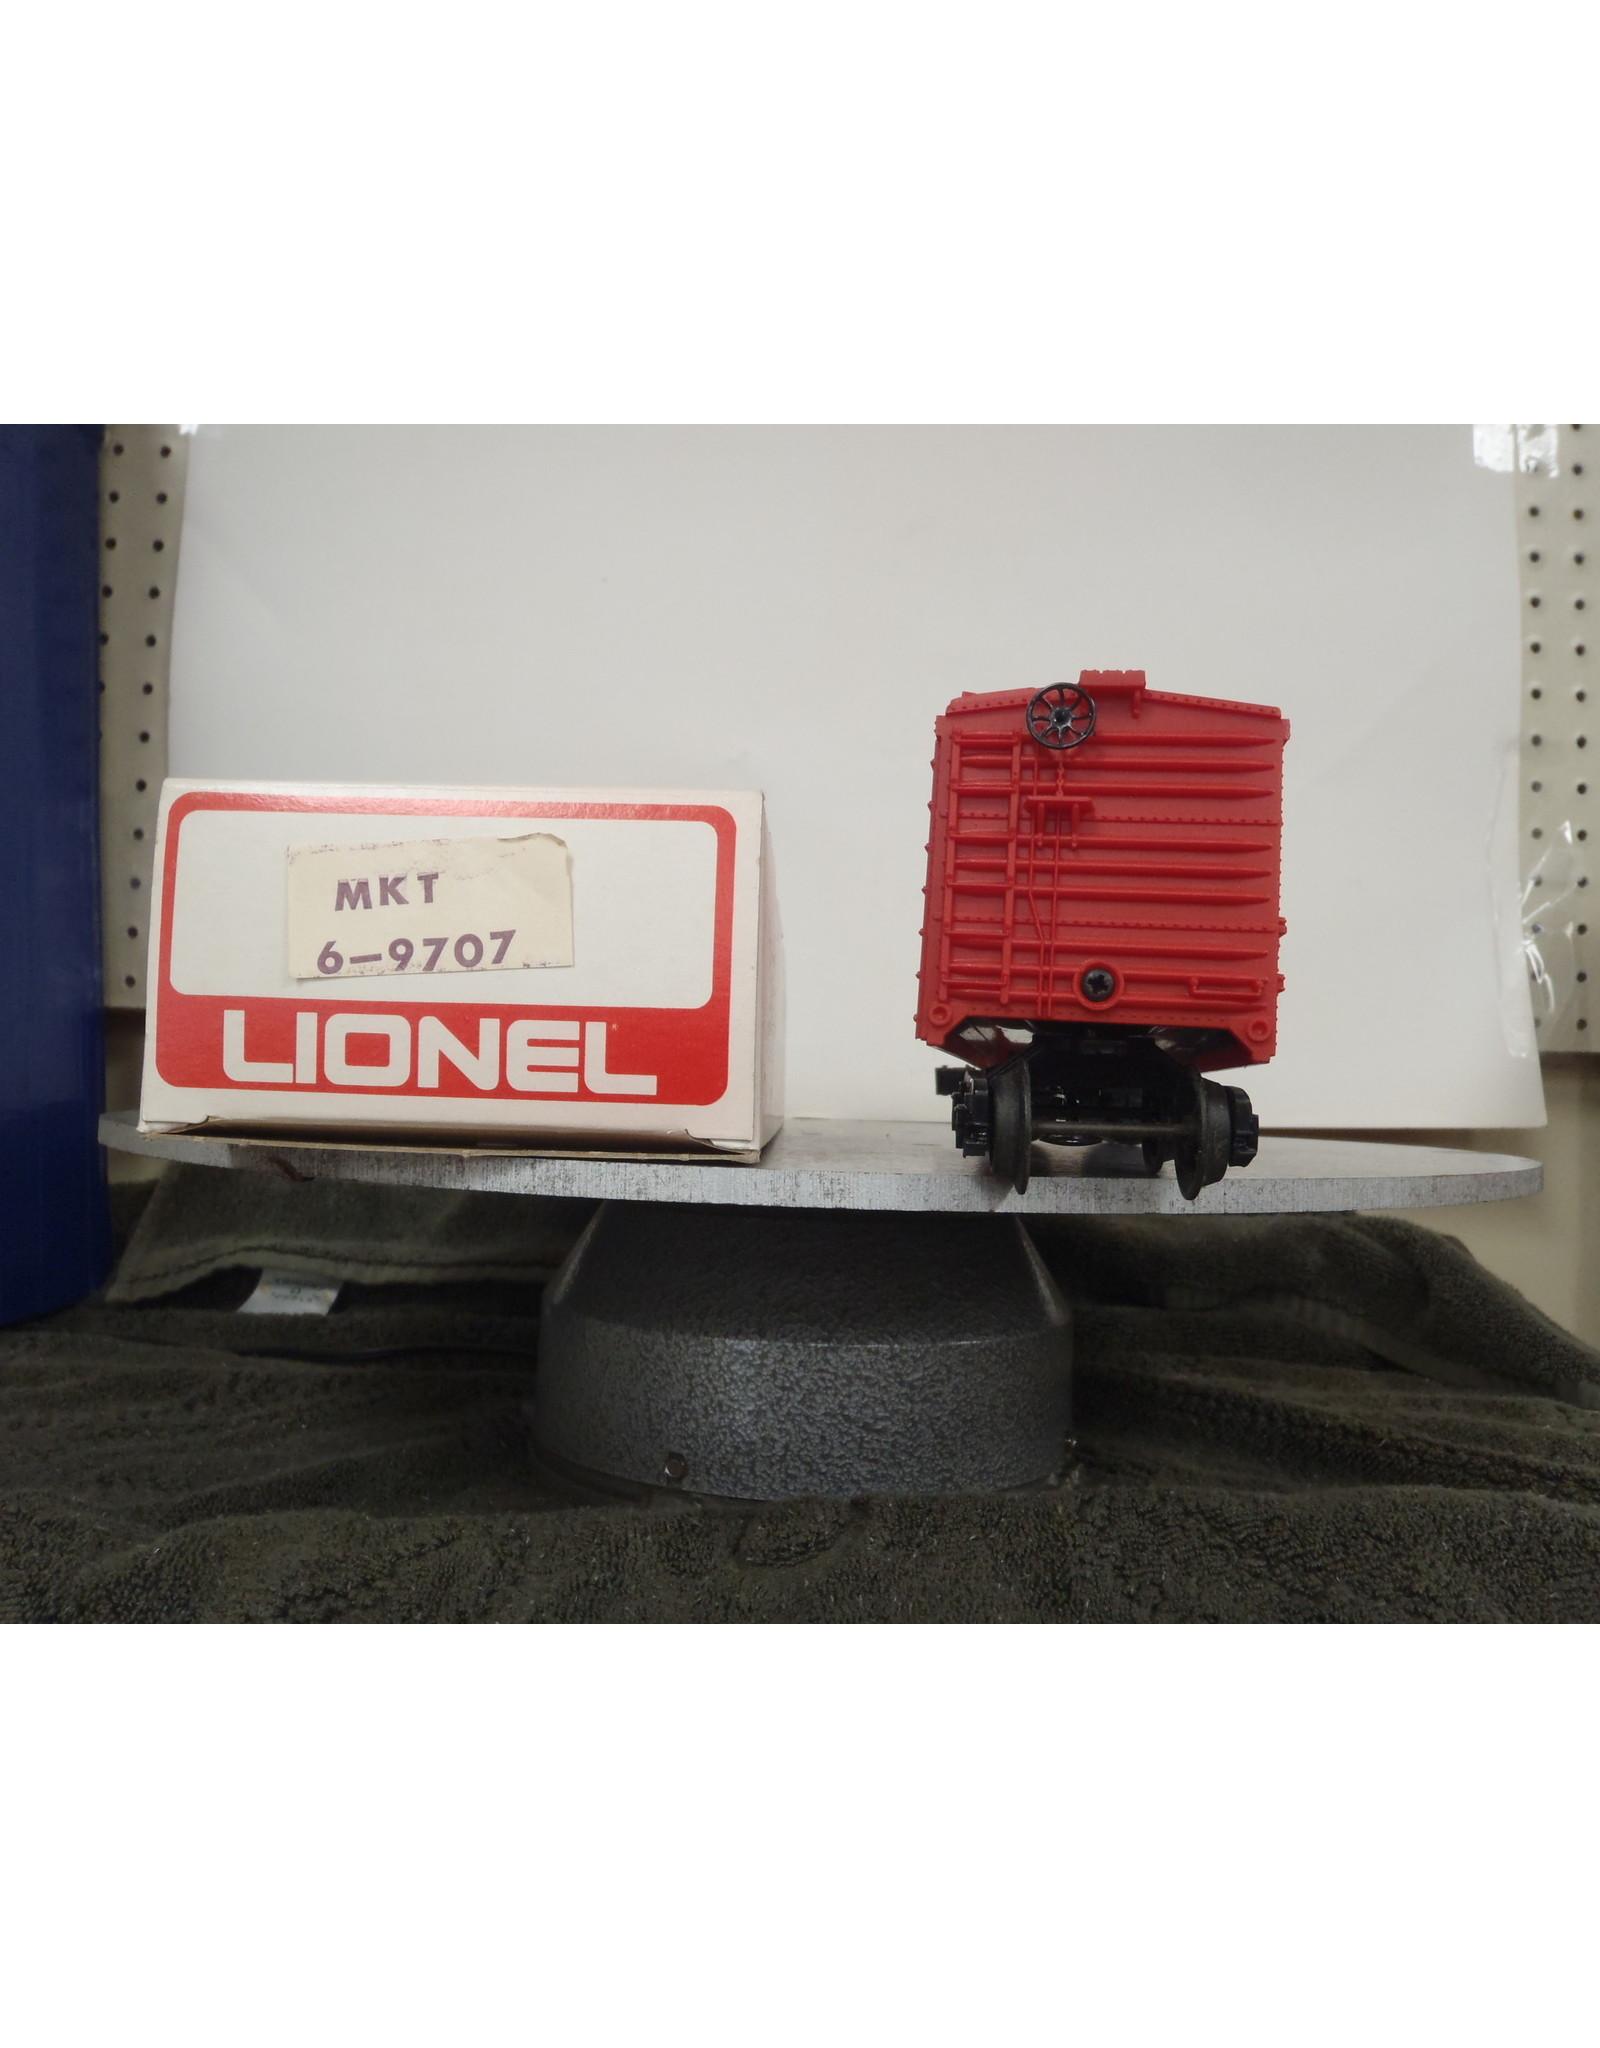 Lionel Lionel 6-9707 MKT Stock Car